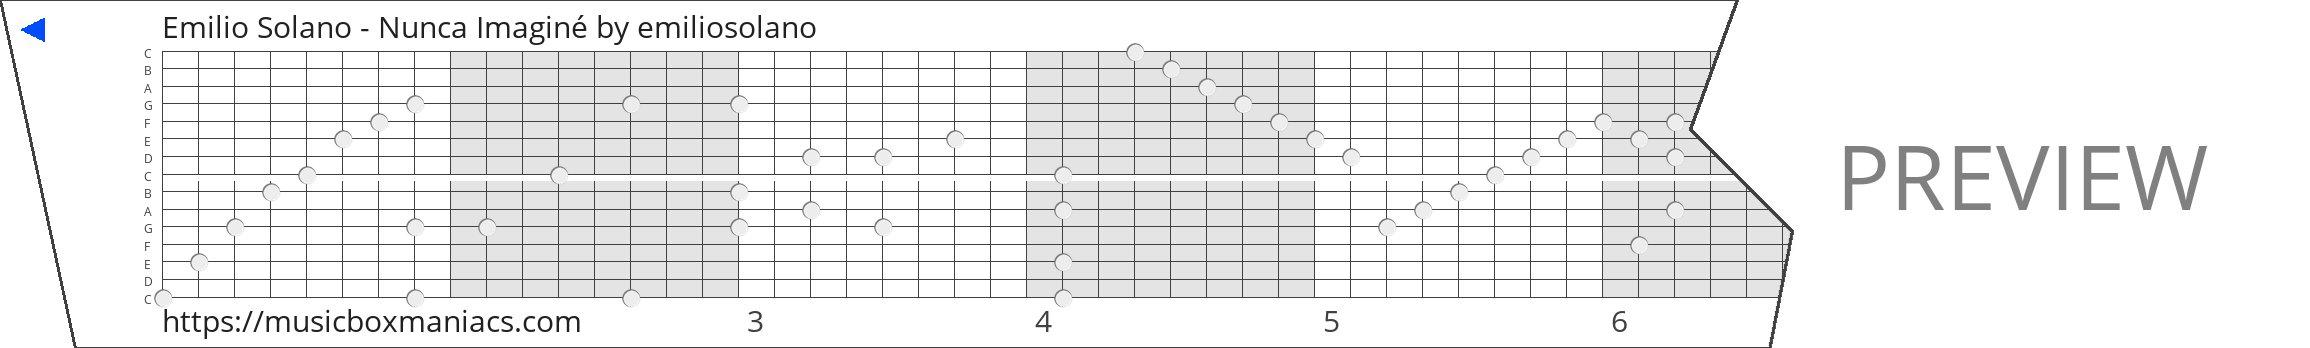 Emilio Solano - Nunca Imaginé 15 note music box paper strip